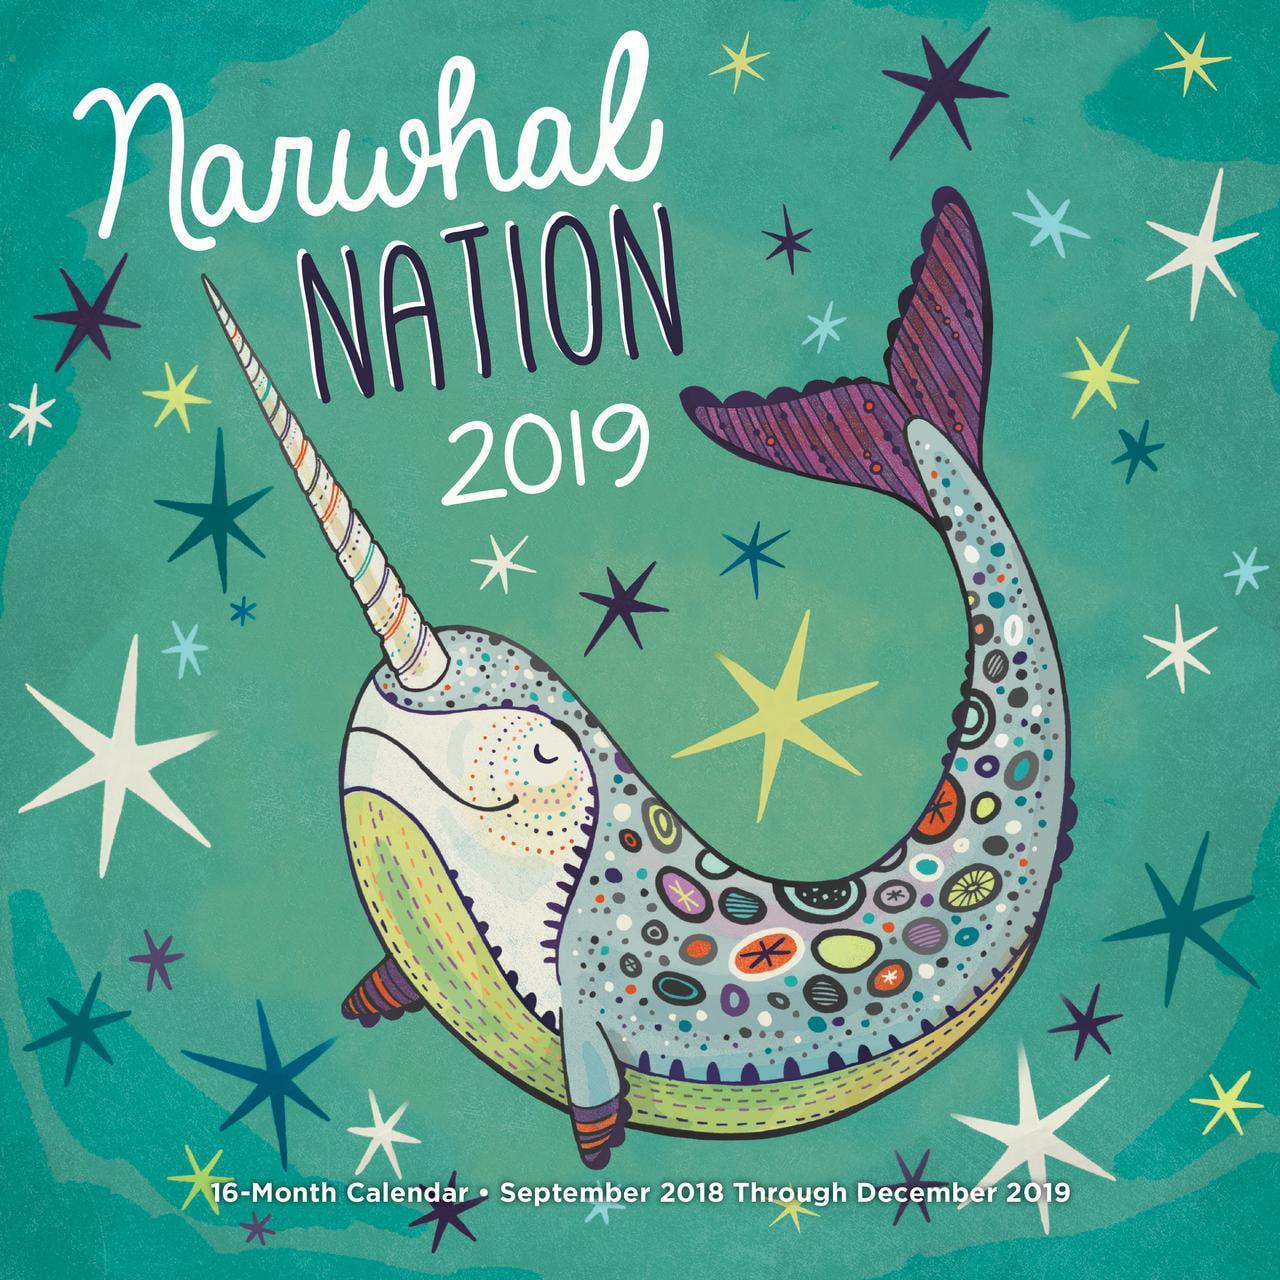 Narwhal Nation 2019 : 16-Month Calendar - September 2018 through December 2019